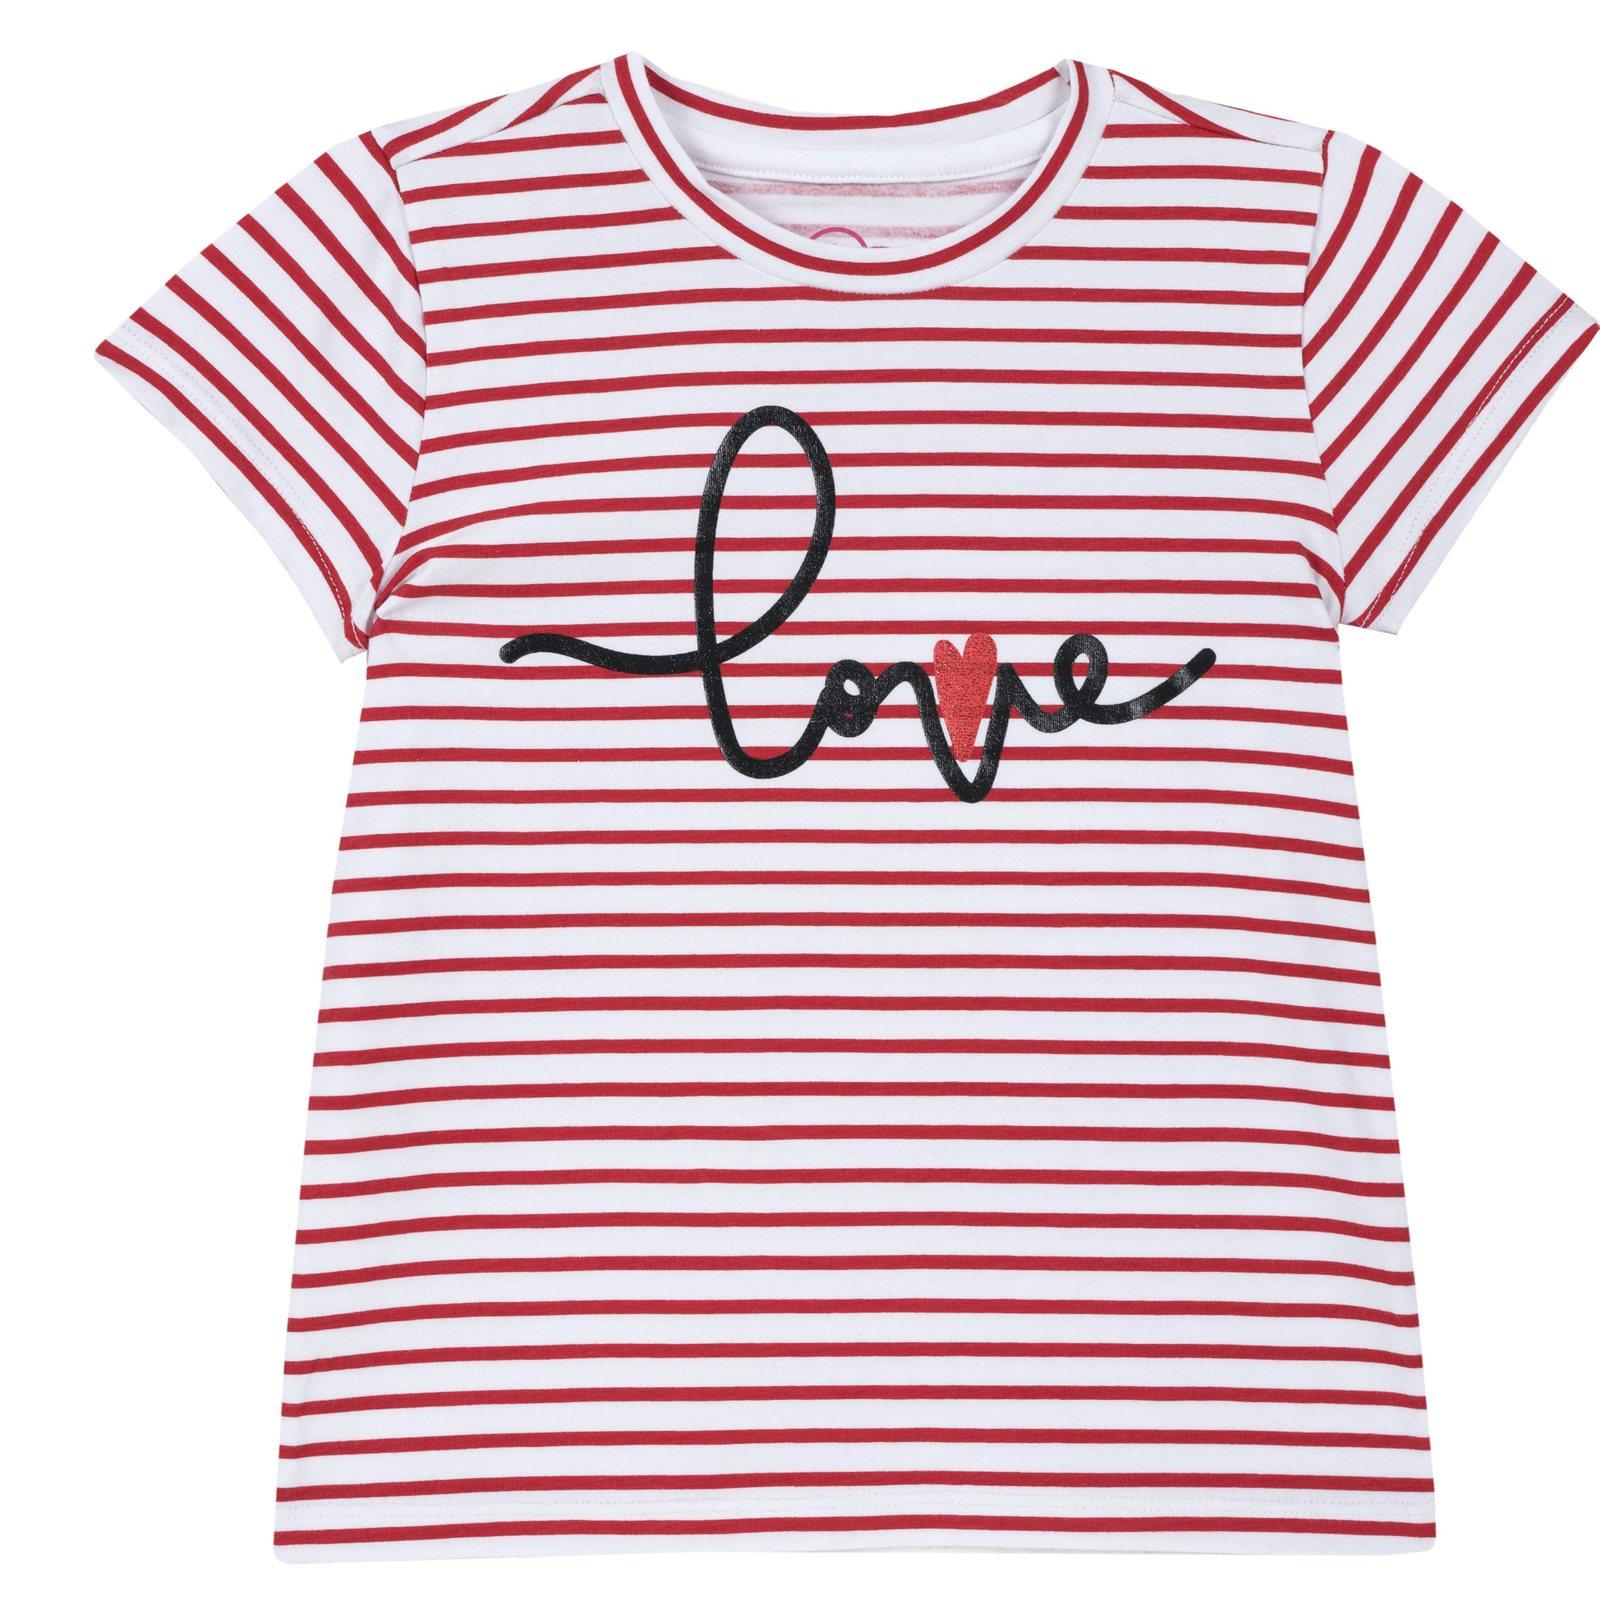 a8617b2d7c Camicie e T-shirt bambina t-shirt love a righe rosso rigato ...